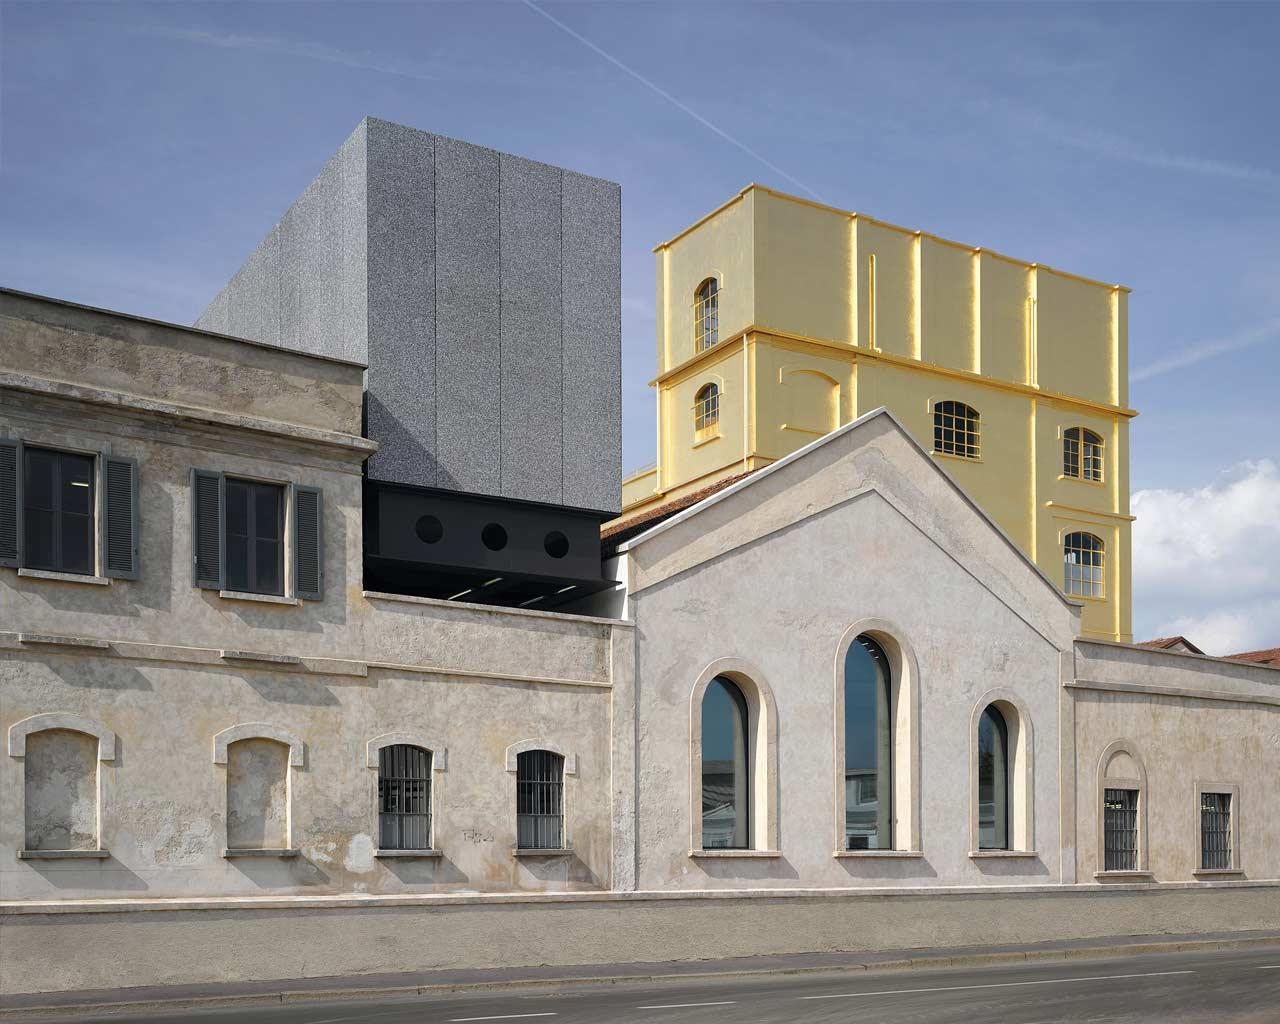 Fondazione Prada, Milano 2017. Ph. Bas Princen